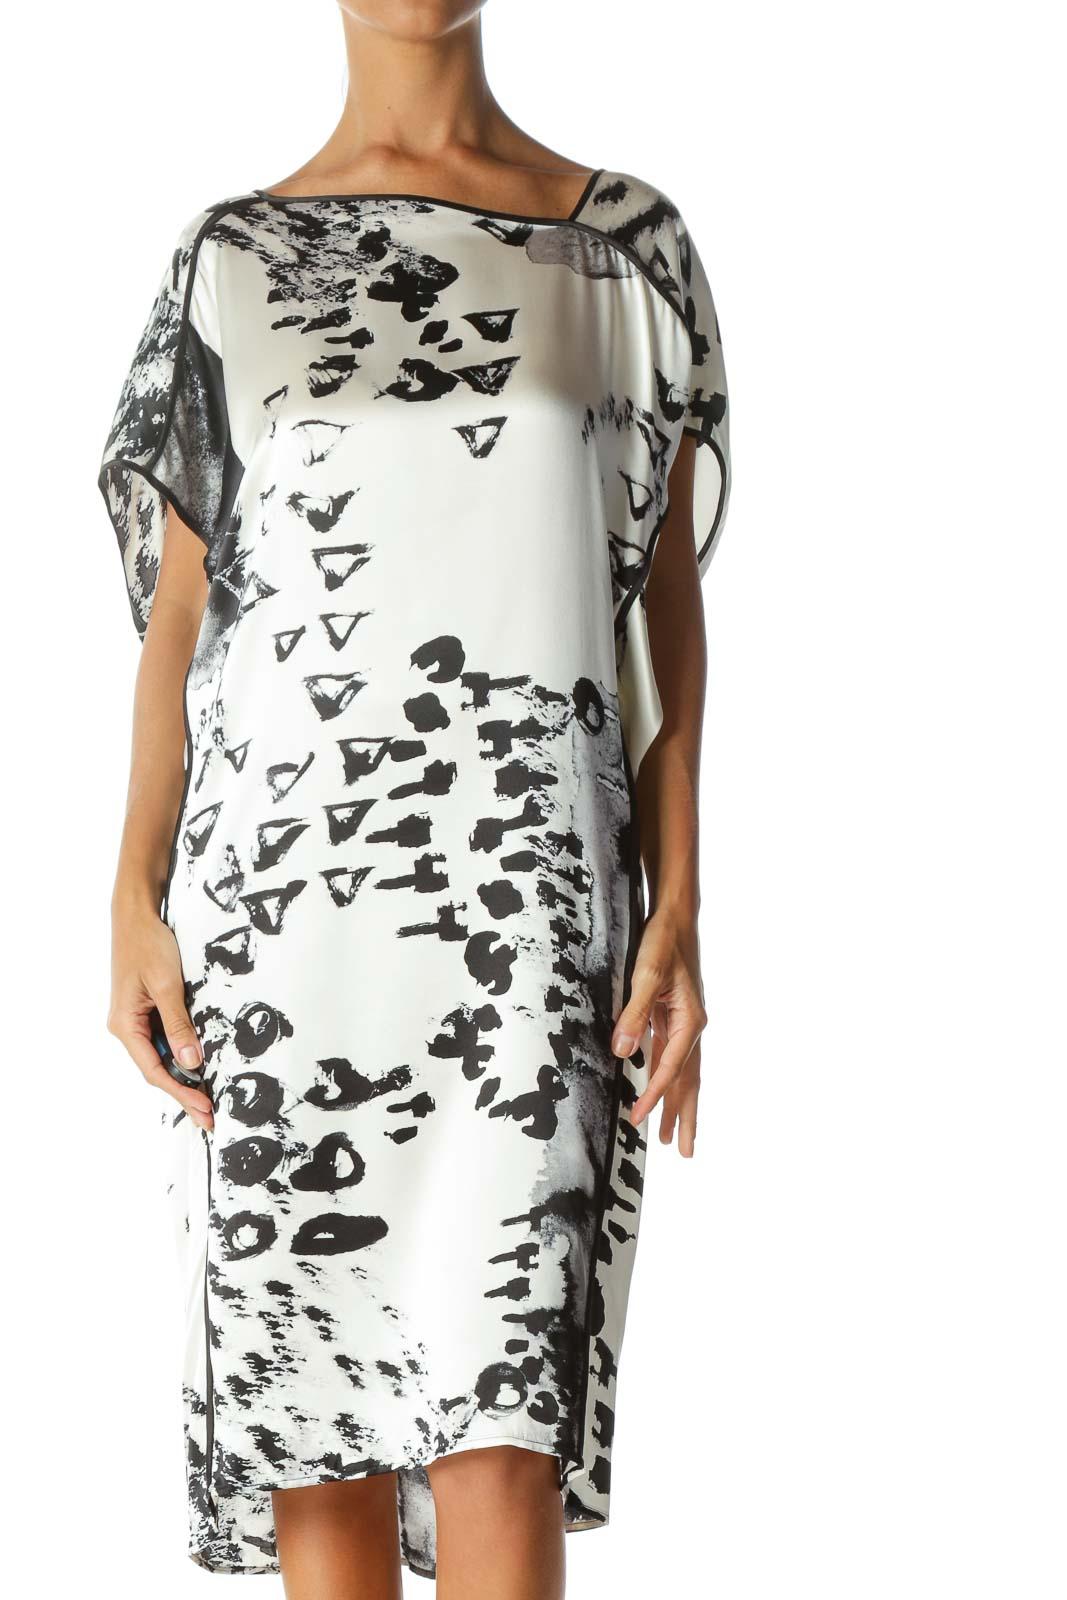 Black Cream 100% Silk Printed Asymmetric Neckline Pull-On Dress Front